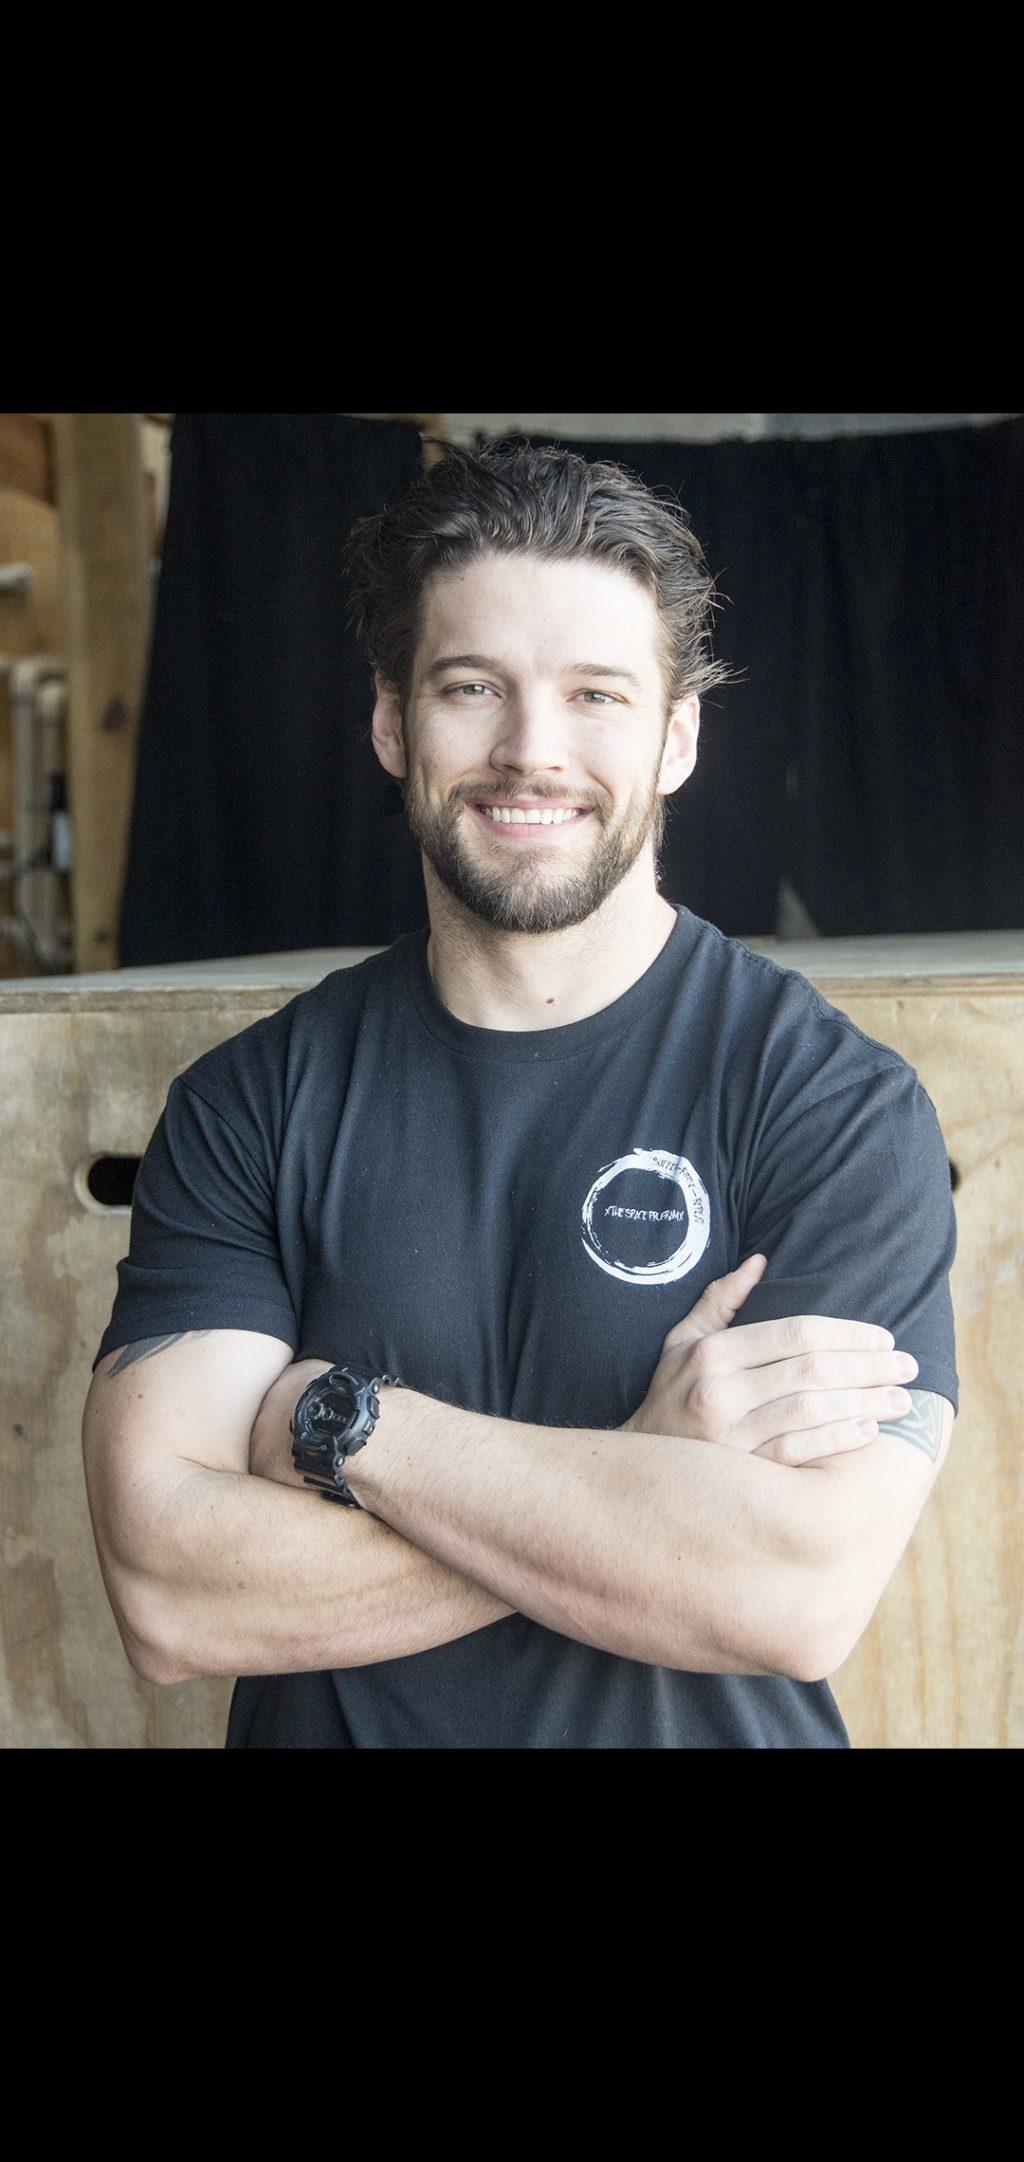 Personal Trainer Dallas, Texas - Tyler McCann